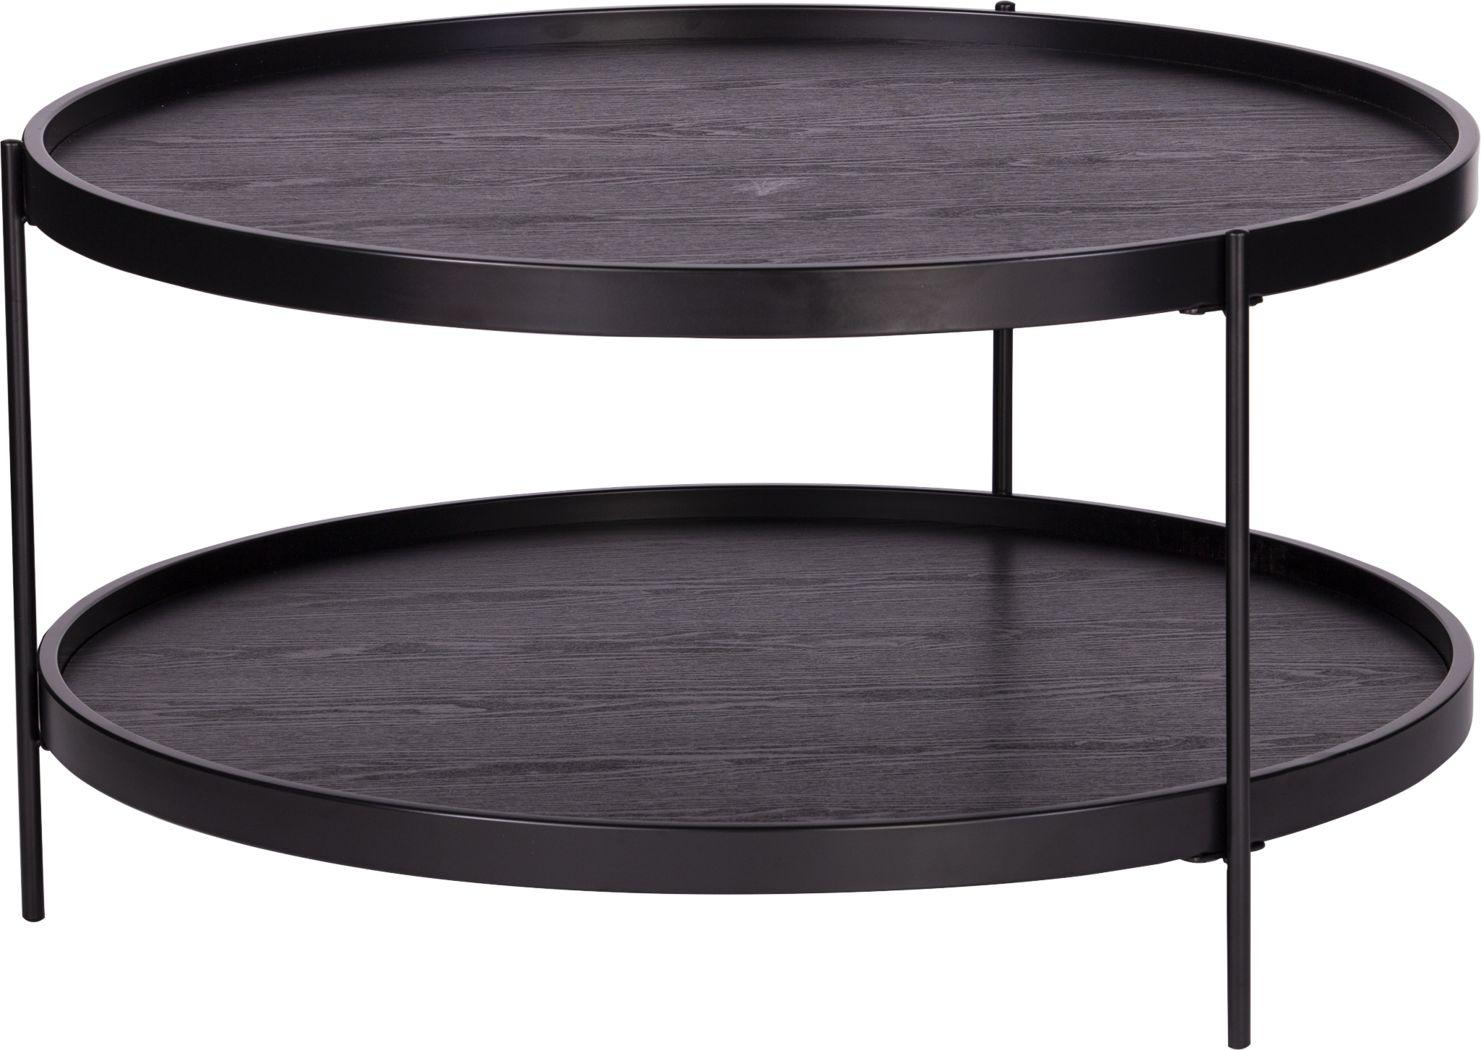 Coolfont Court Black Cocktail Table